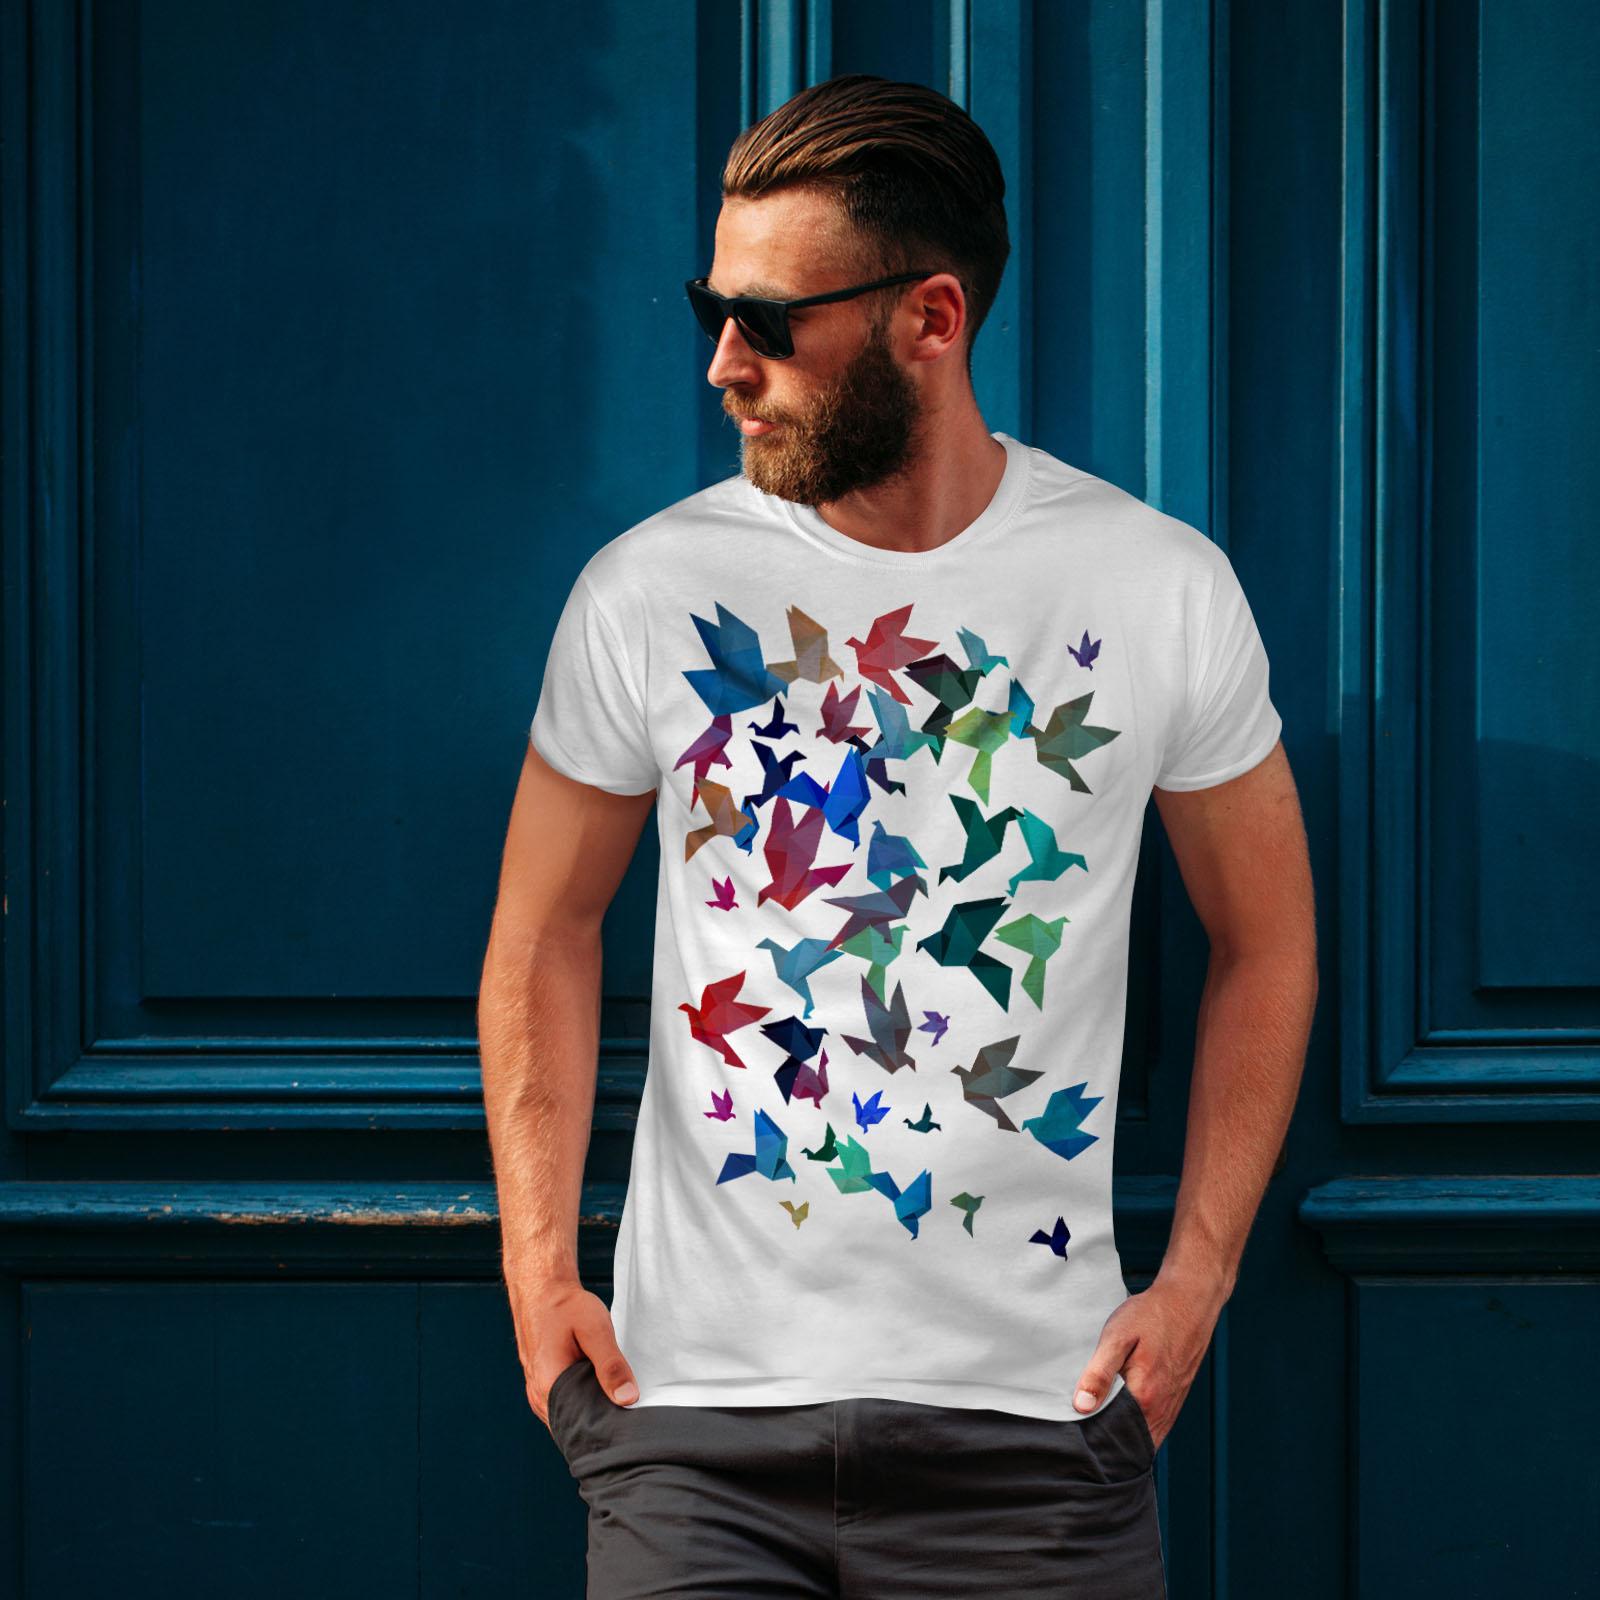 Wellcoda-Origami-Bird-Colors-Mens-T-shirt-Craft-Graphic-Design-Printed-Tee thumbnail 10